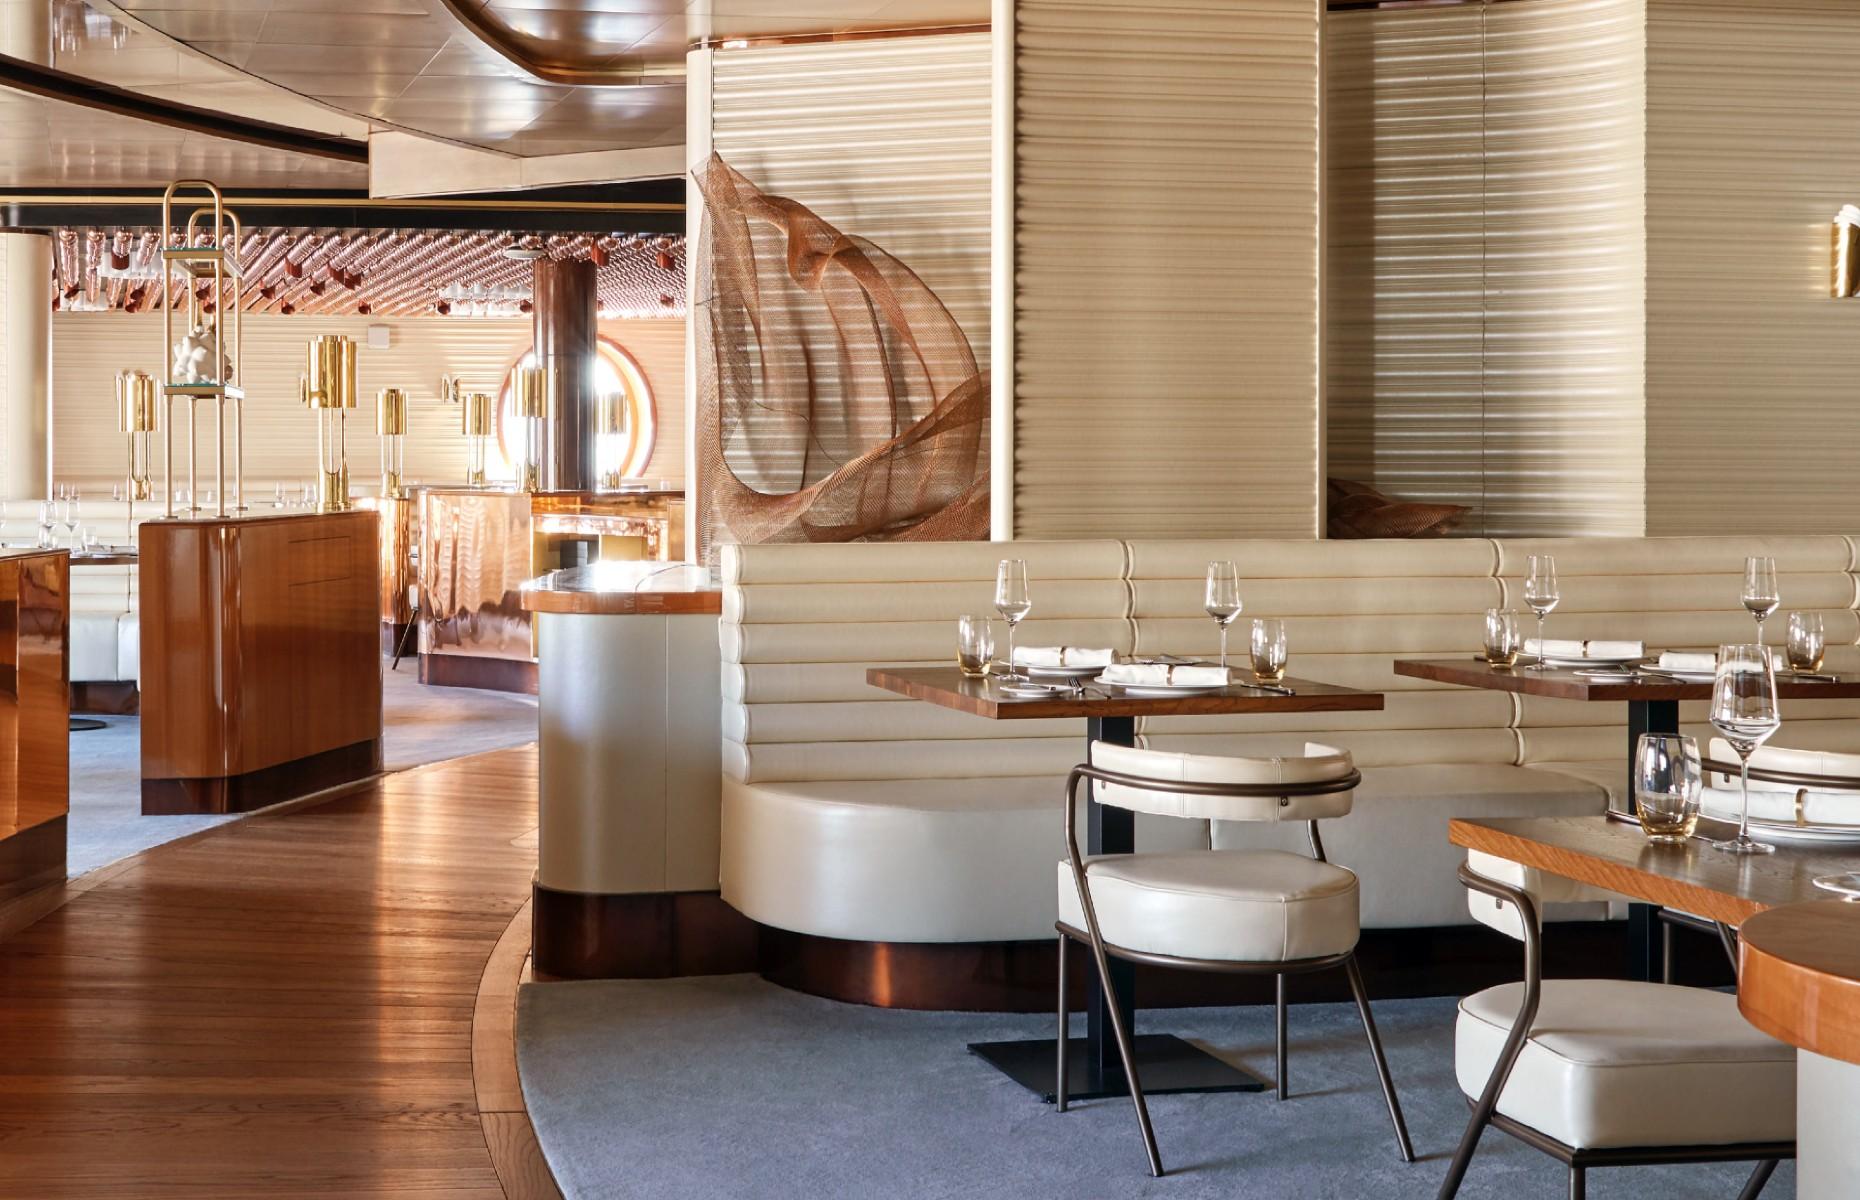 The Wake restaurant (Image: Virgin Voyages)